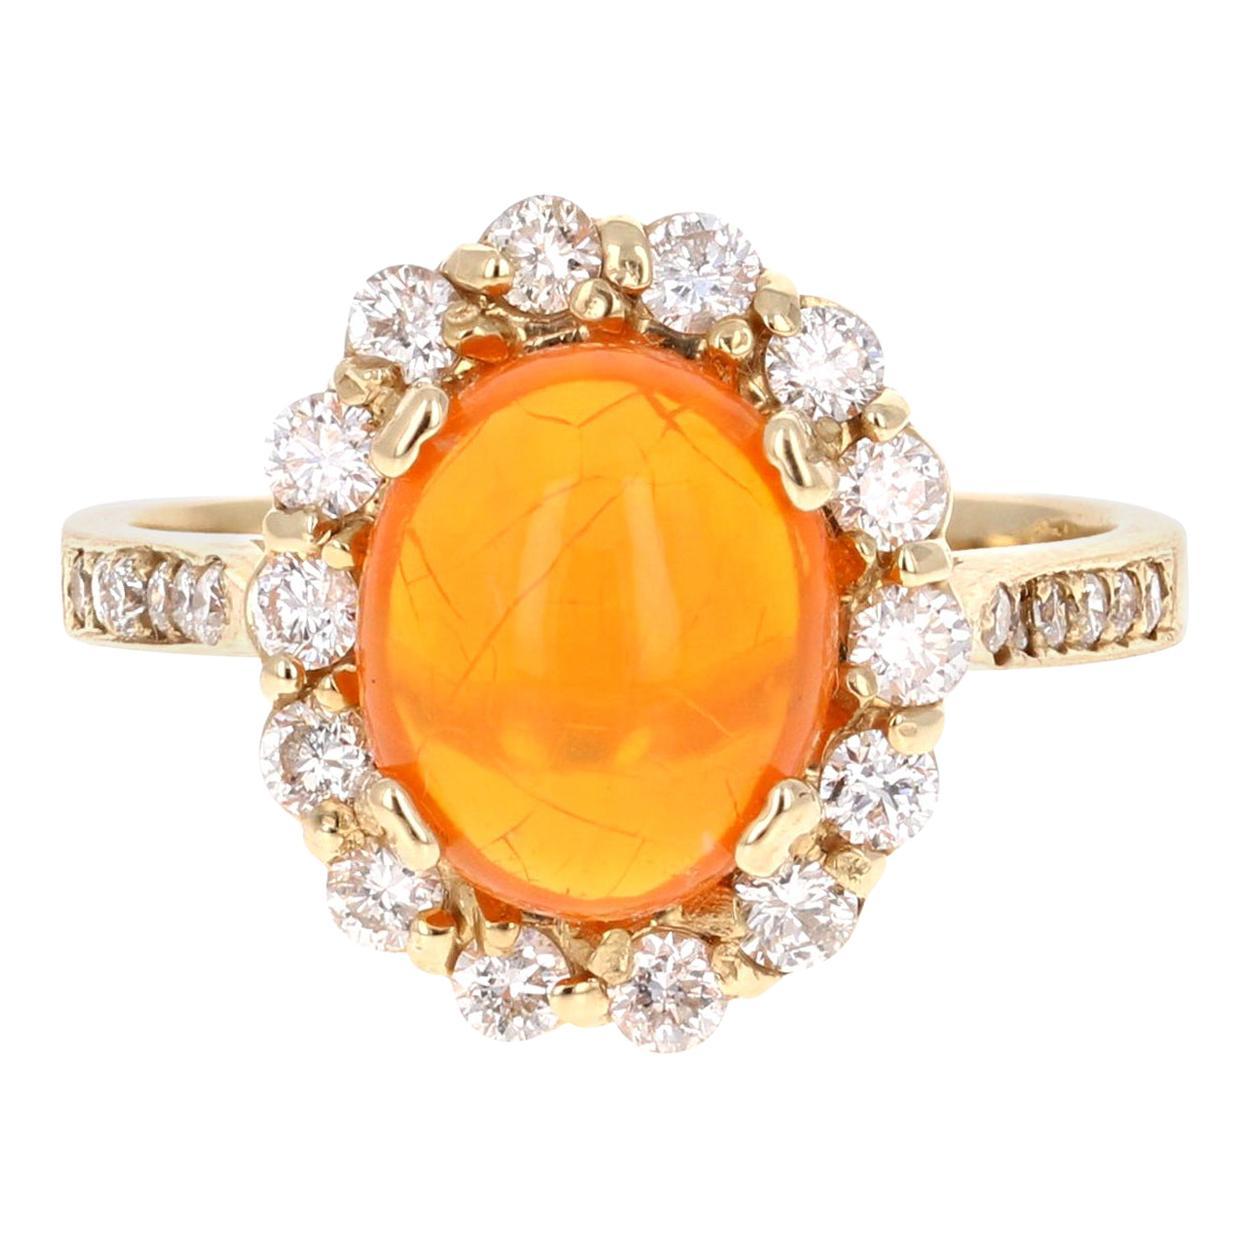 2.84 Carat Oval Cut Ethiopian Opal Diamond Yellow Gold Ring